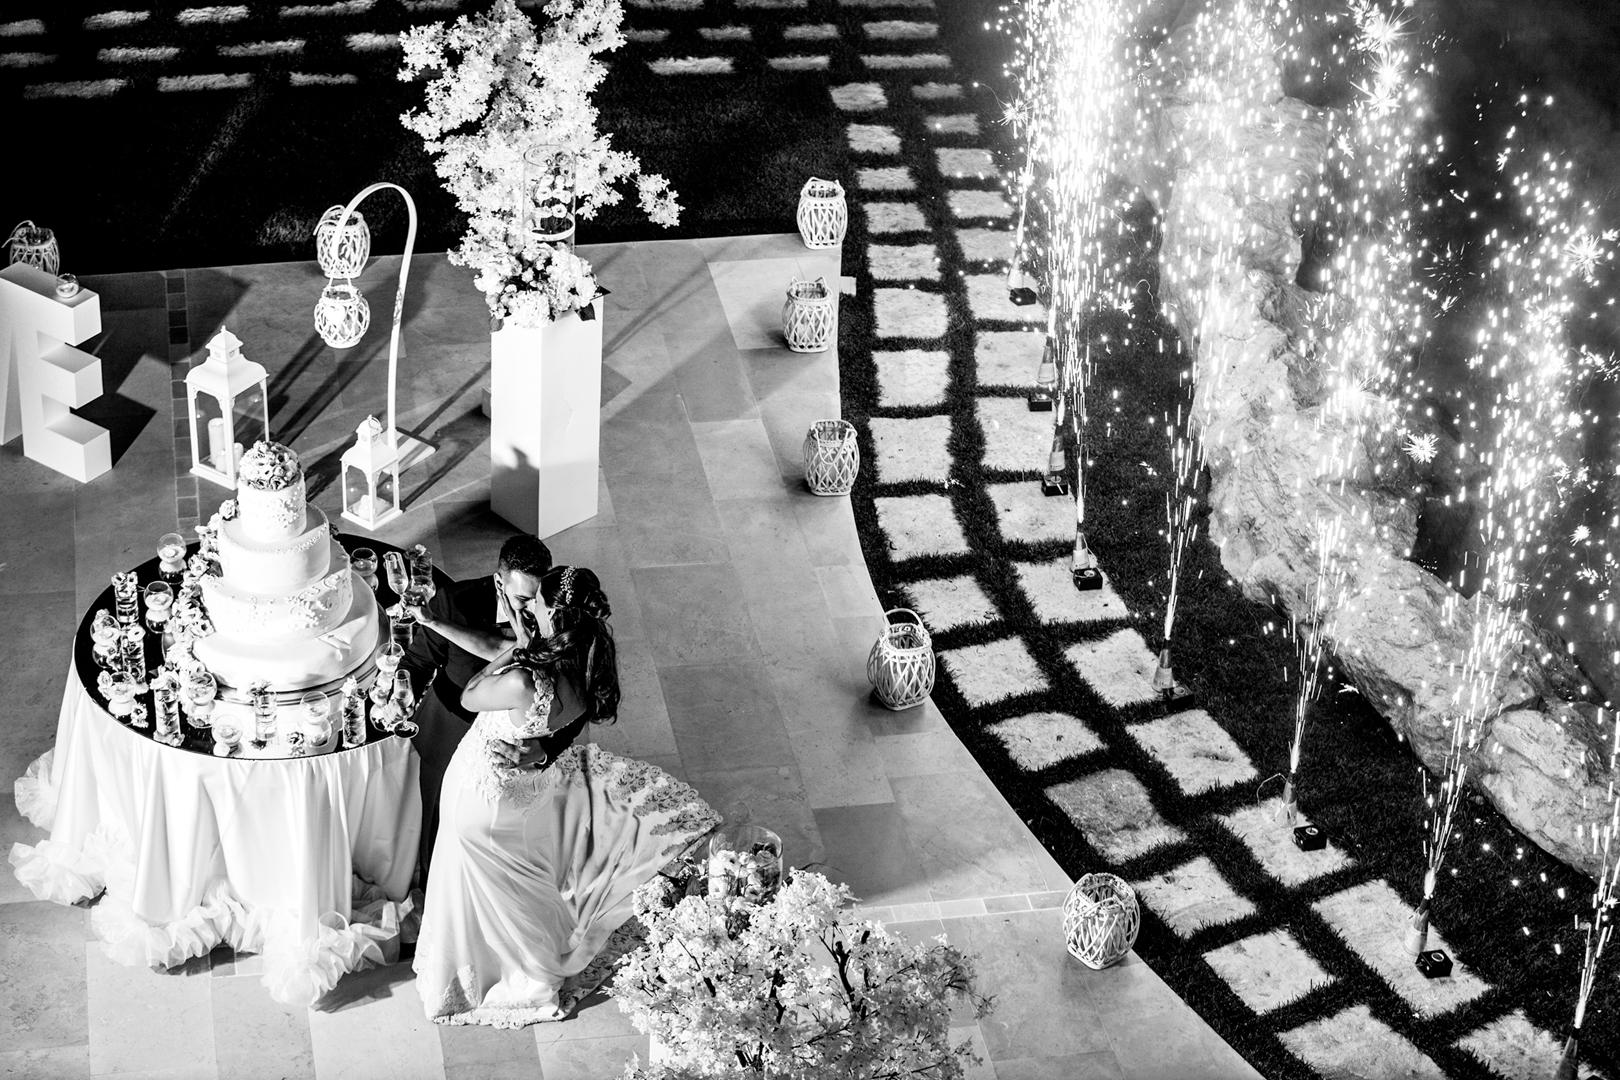 37 gianni-lepore-fotografo-sposi-torta-reportage-taglio-groom-bride-weddingitaly